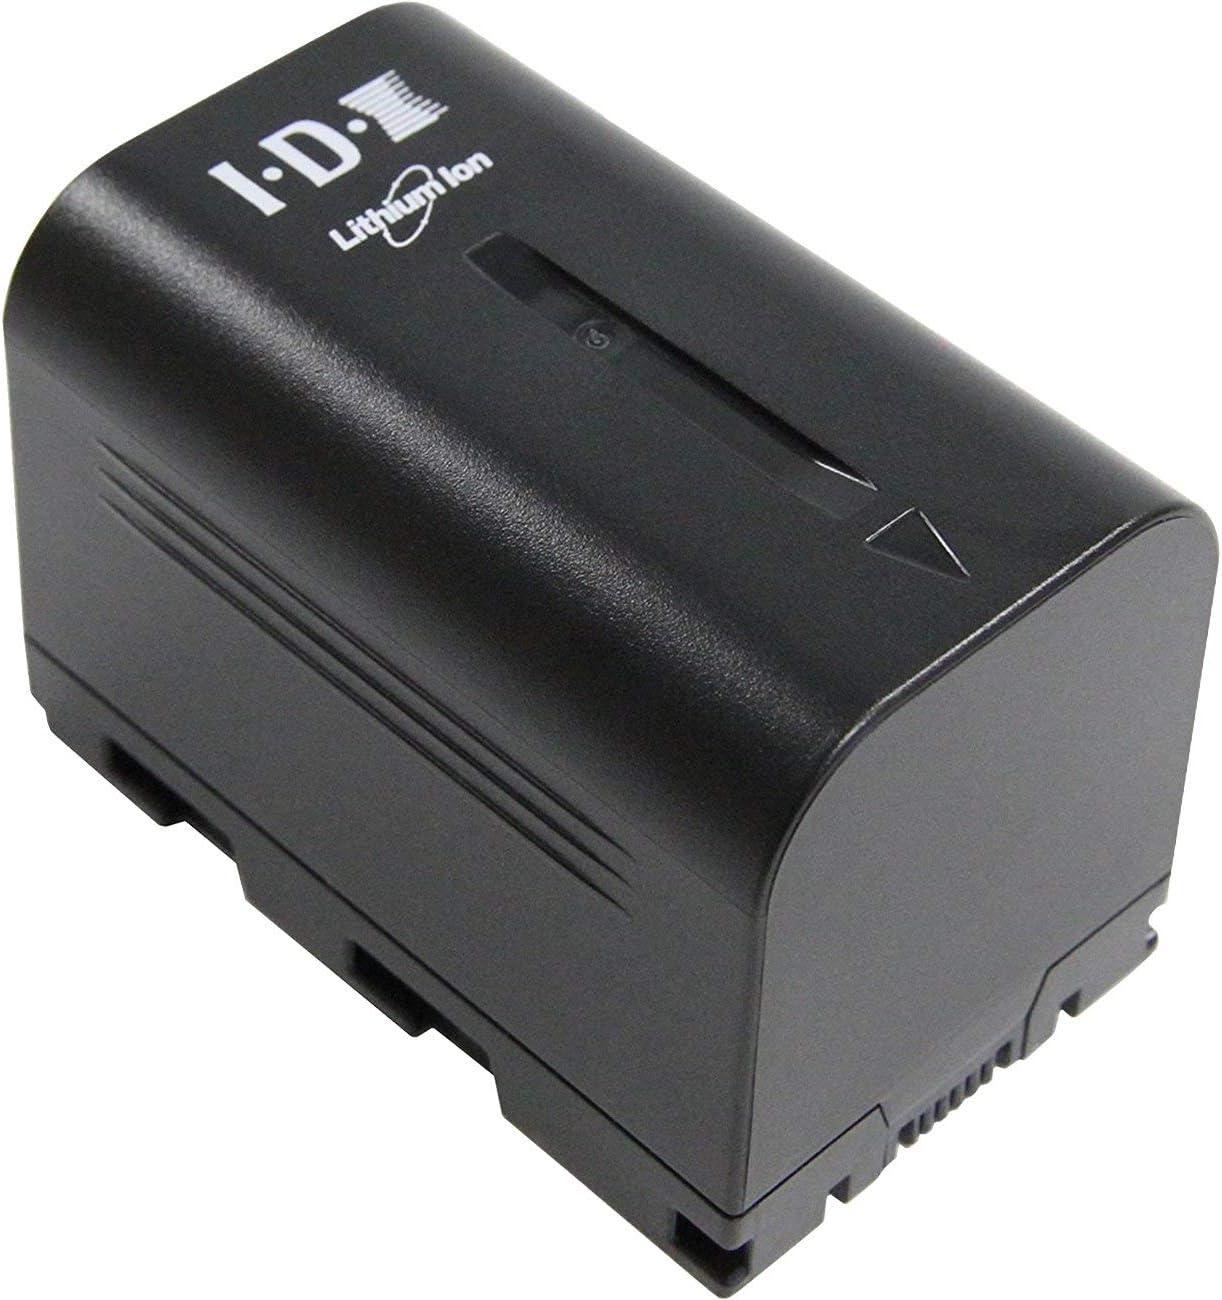 JVC SSL-JVC50 7.4V IDX (OEM) Lithium-Ion Battery for Professional Camcorders